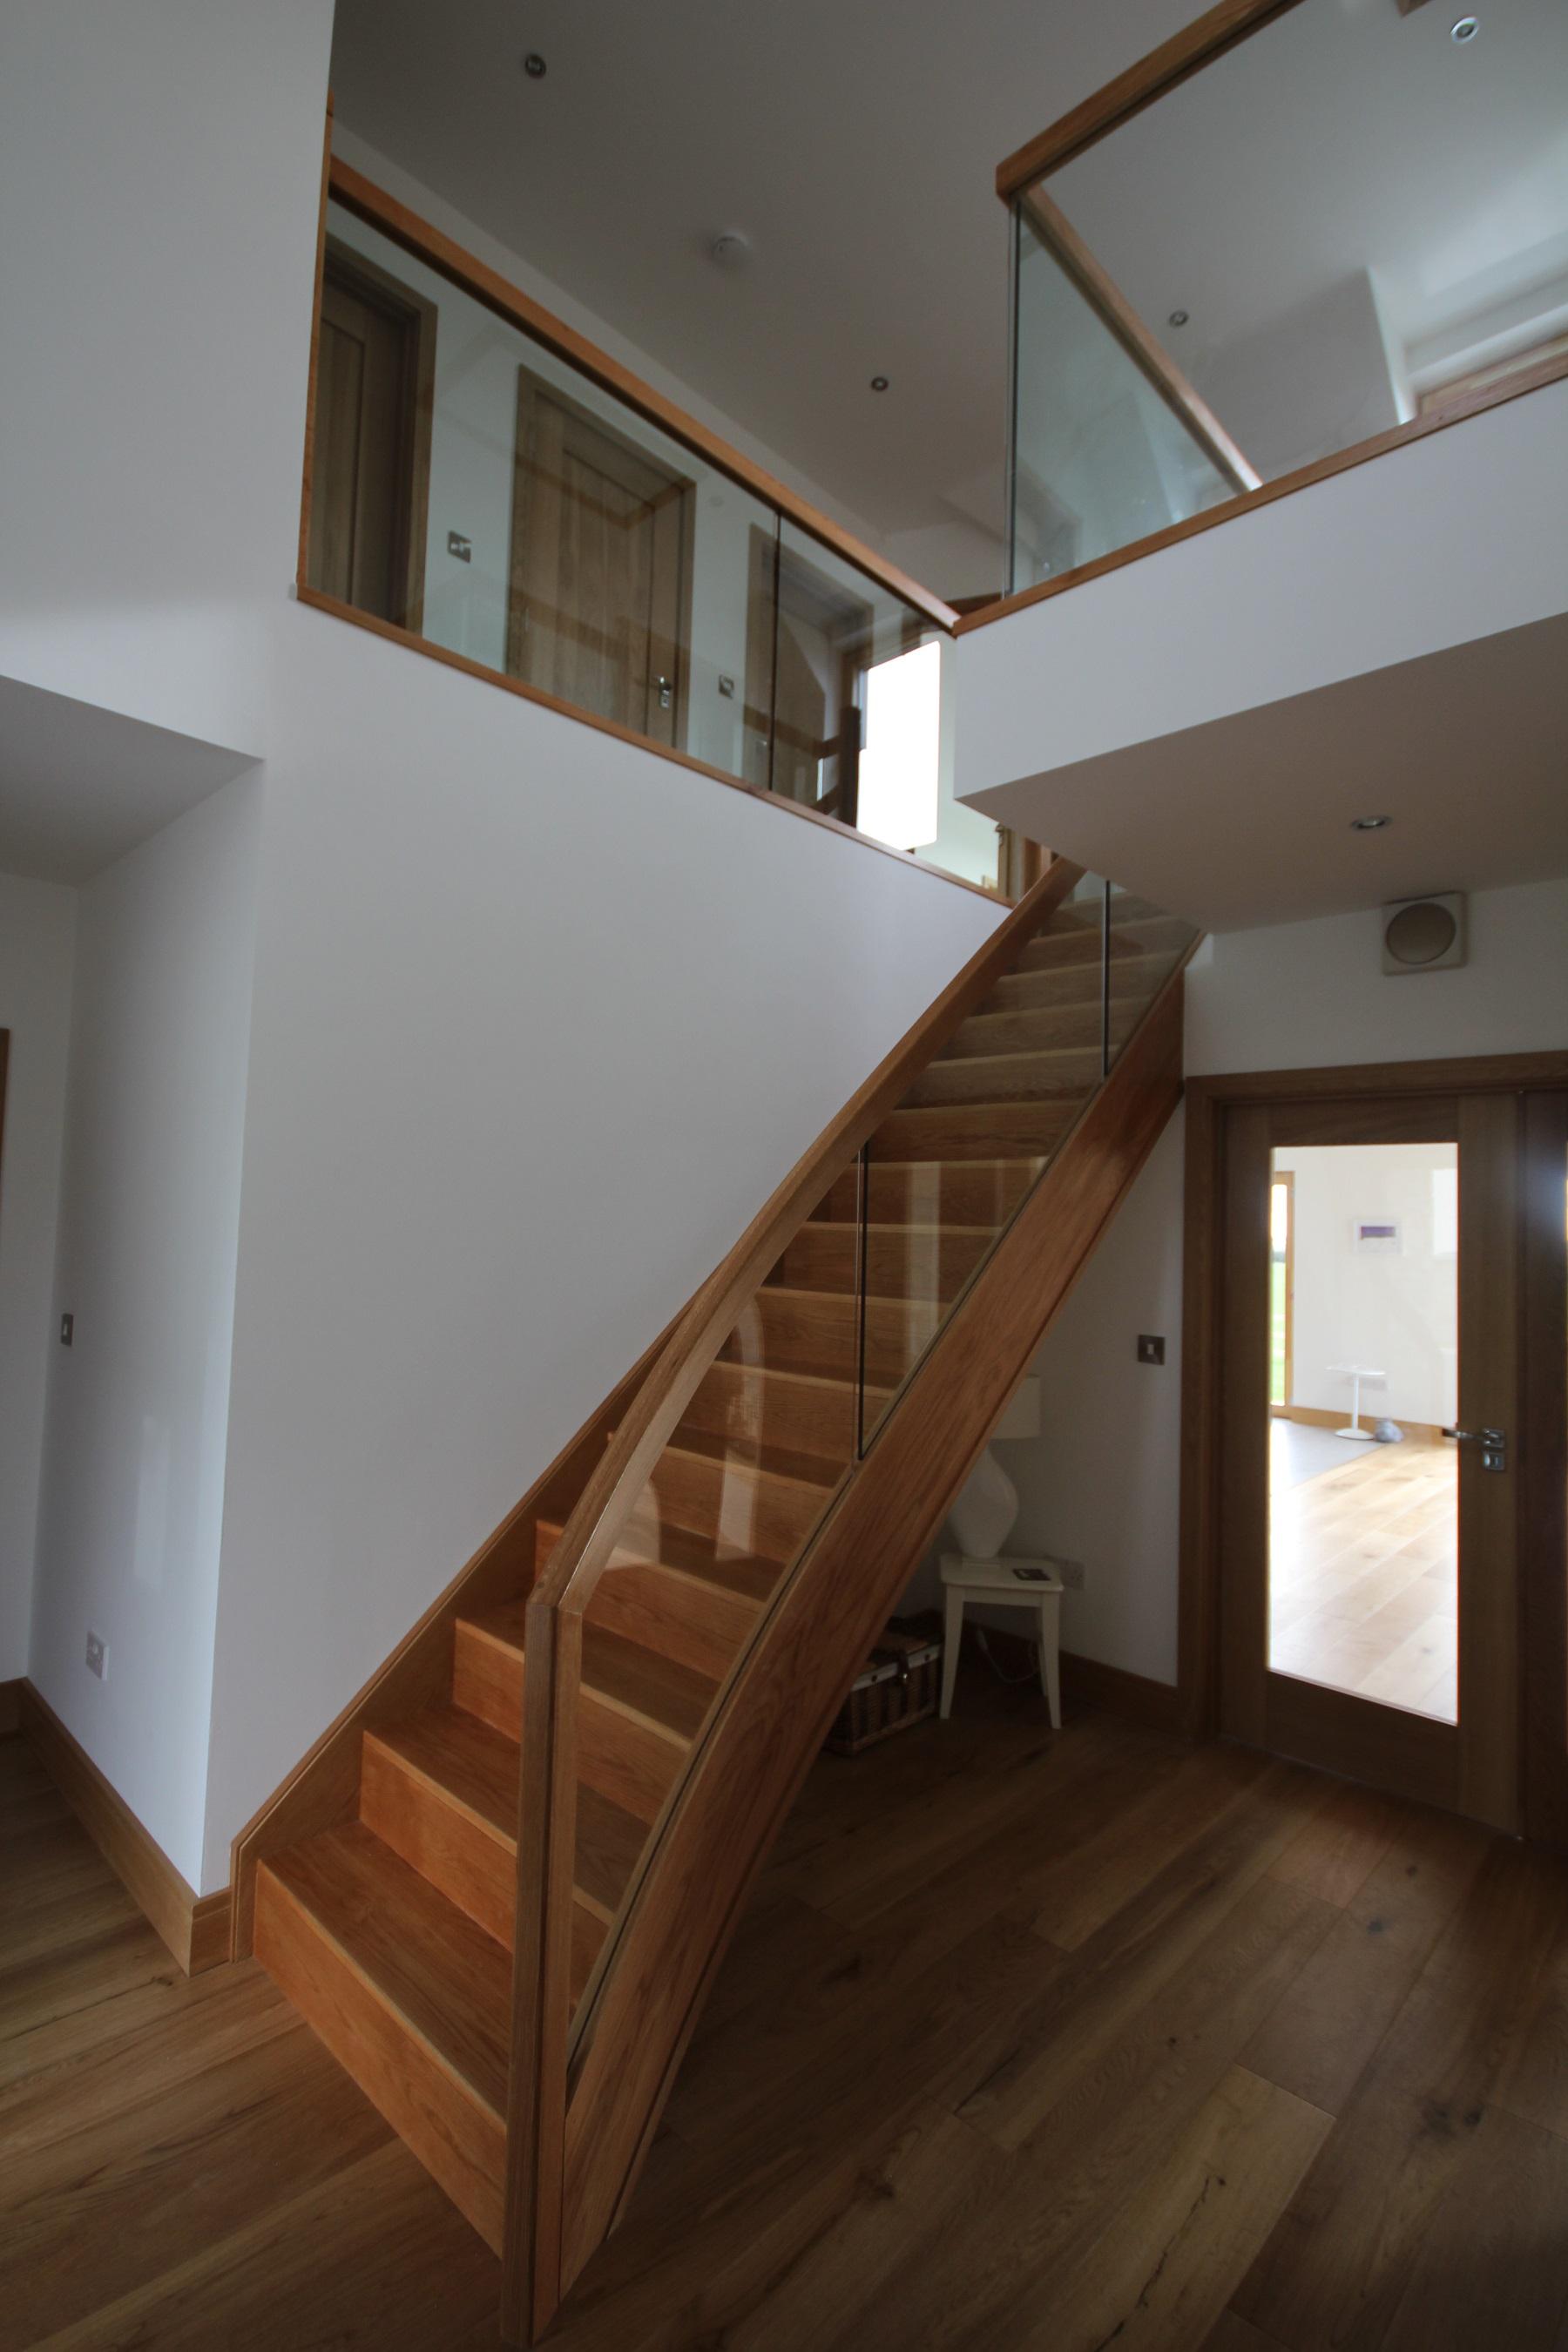 Tuite_Tullyallen_Stairs-01